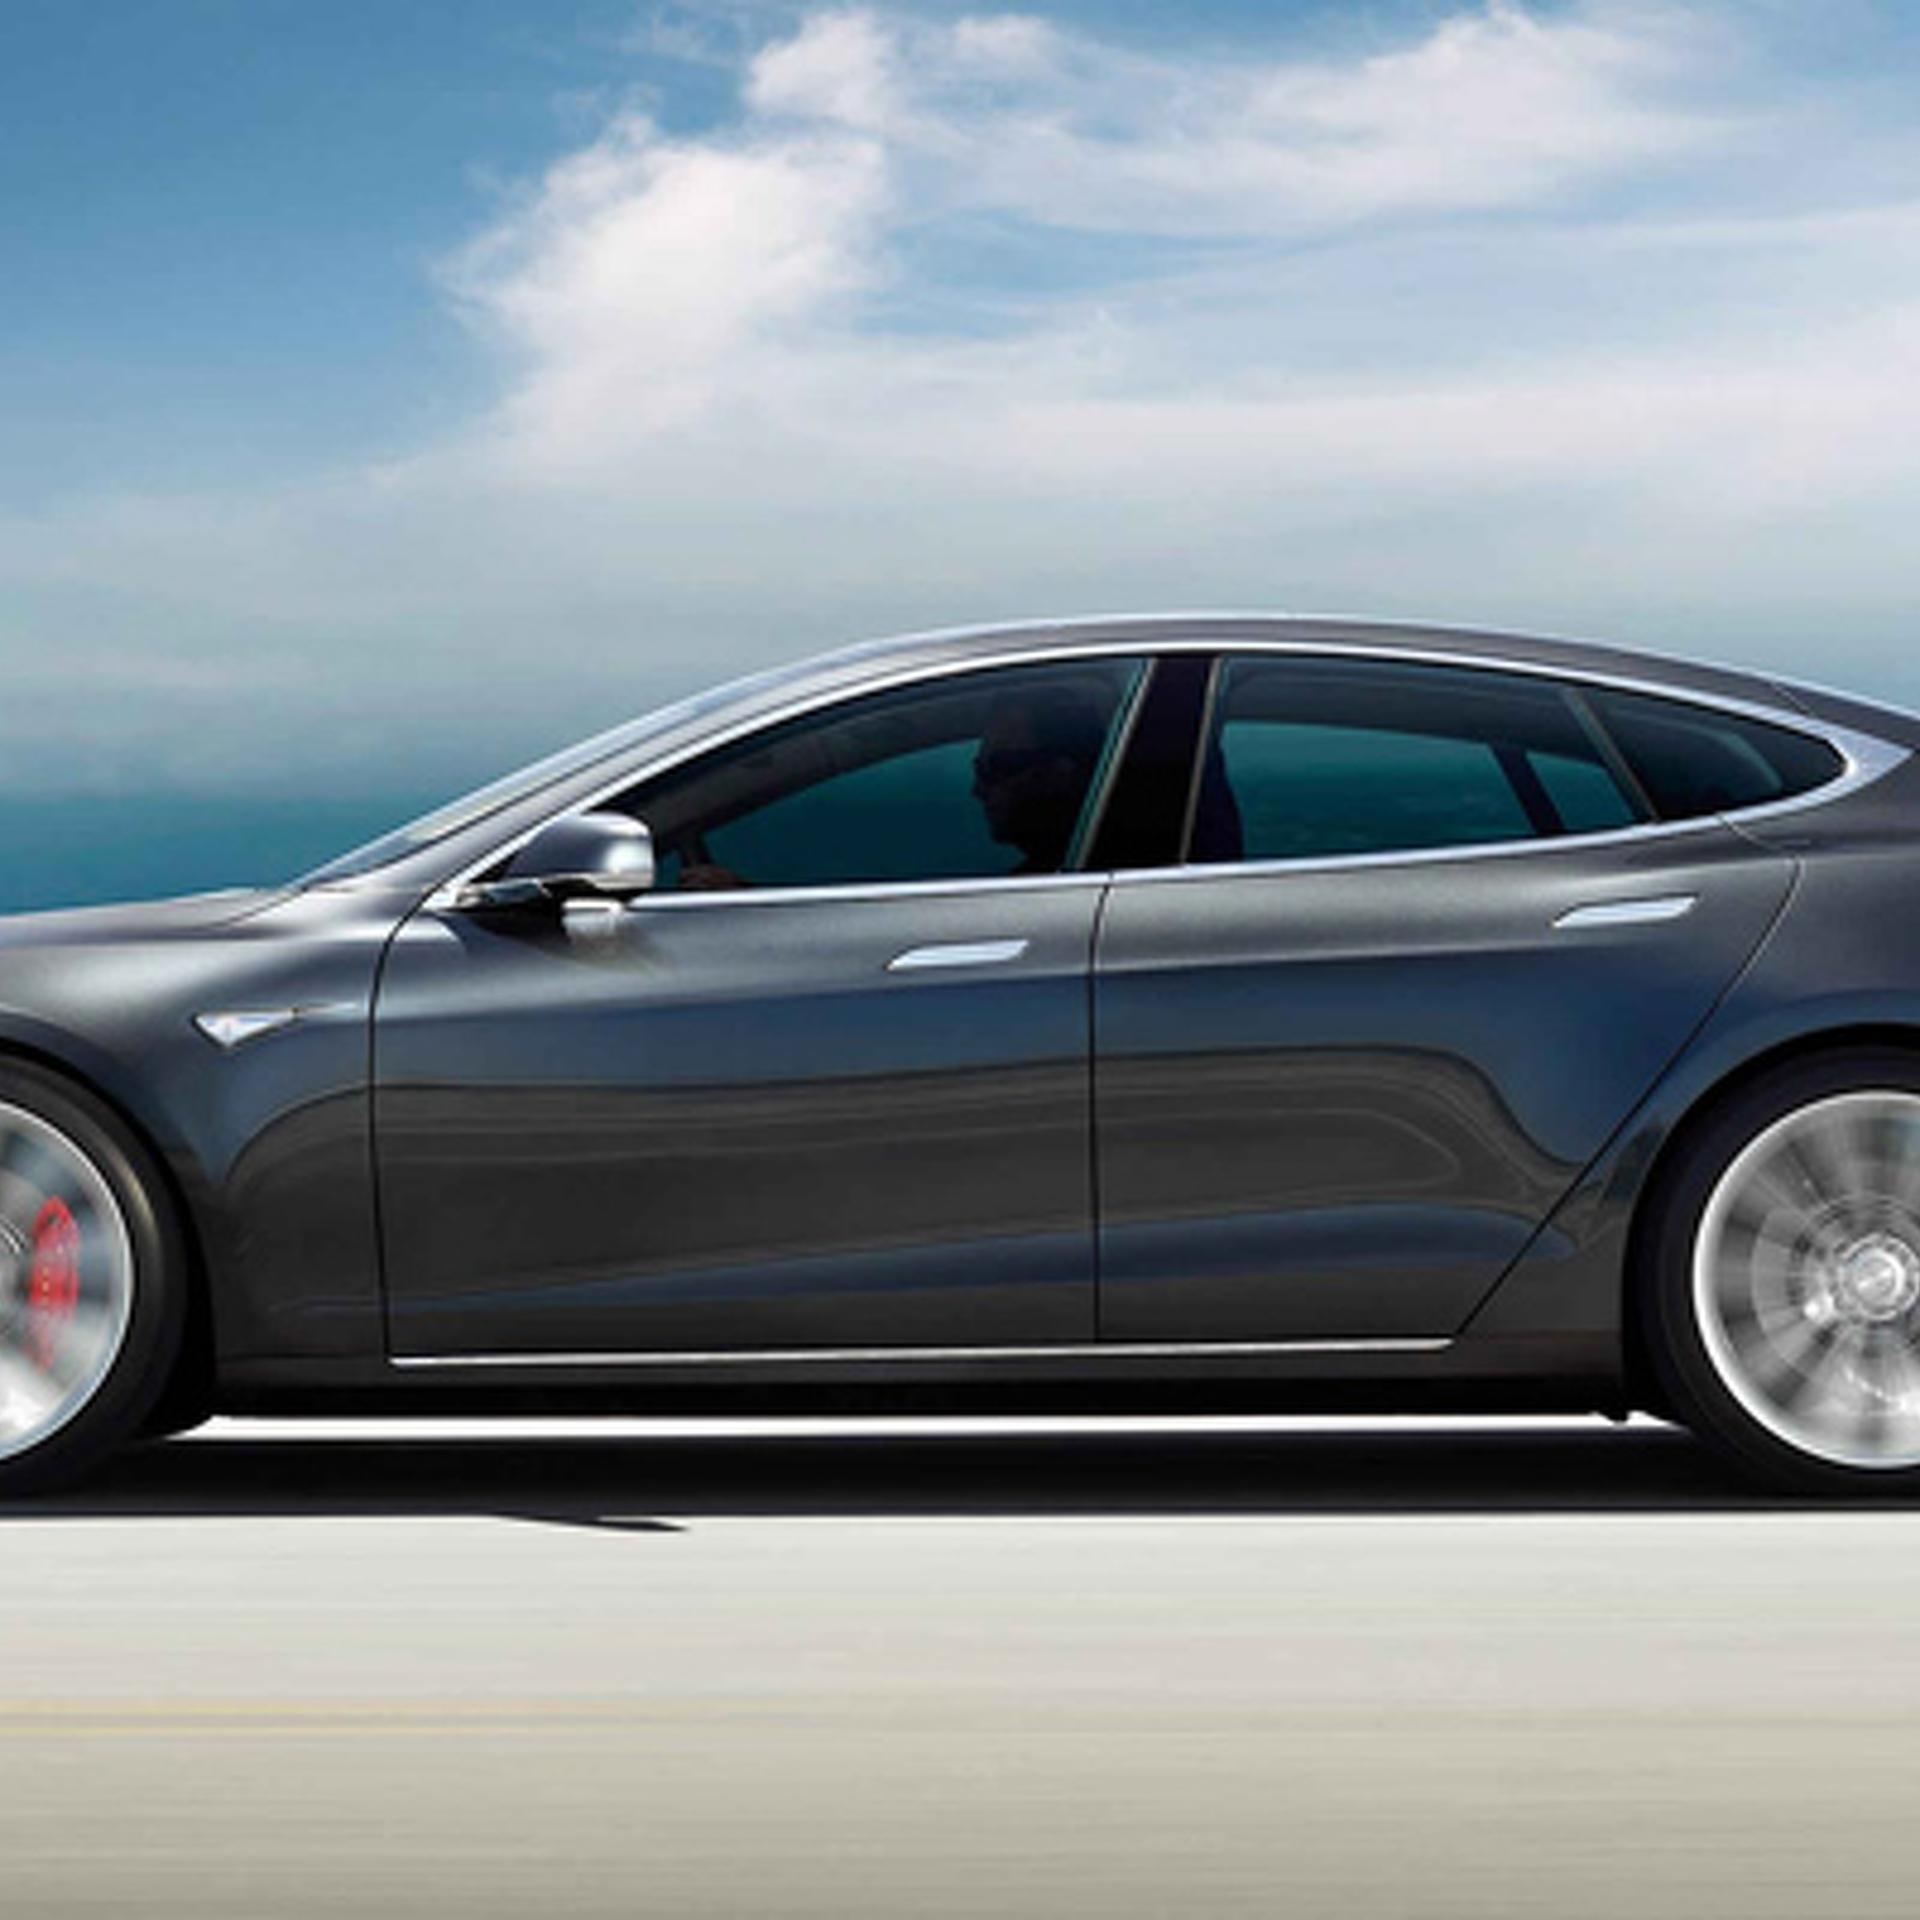 Tesla Roadster Interior Tesla Roadster Coming Soon Widodh: The Tesla Model S Is Getting Its Own Electric Racing Series